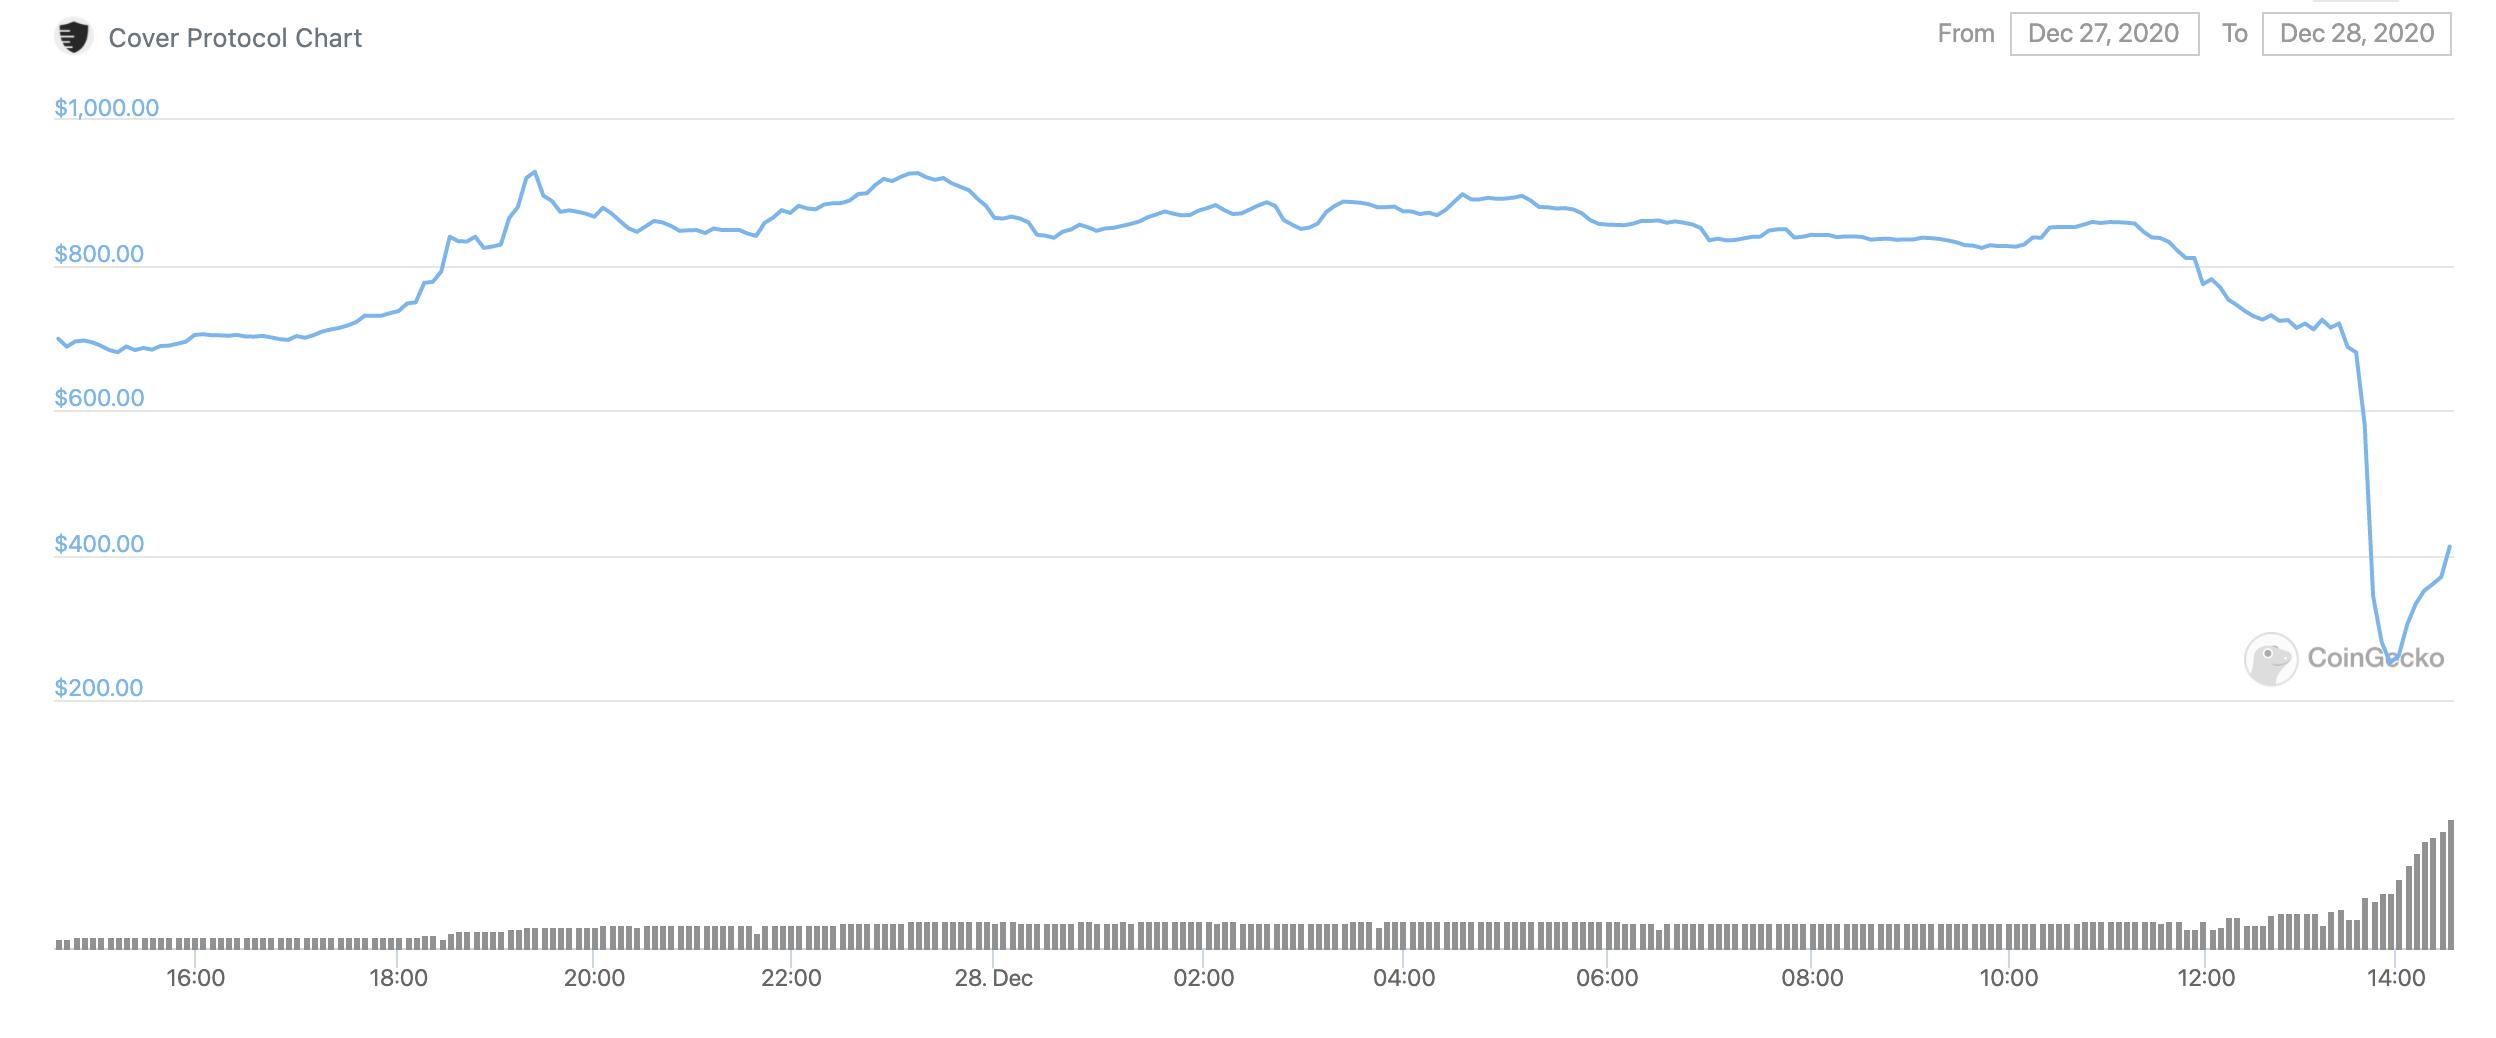 coingecko-cover-protocol-dolar-usd-fiyat